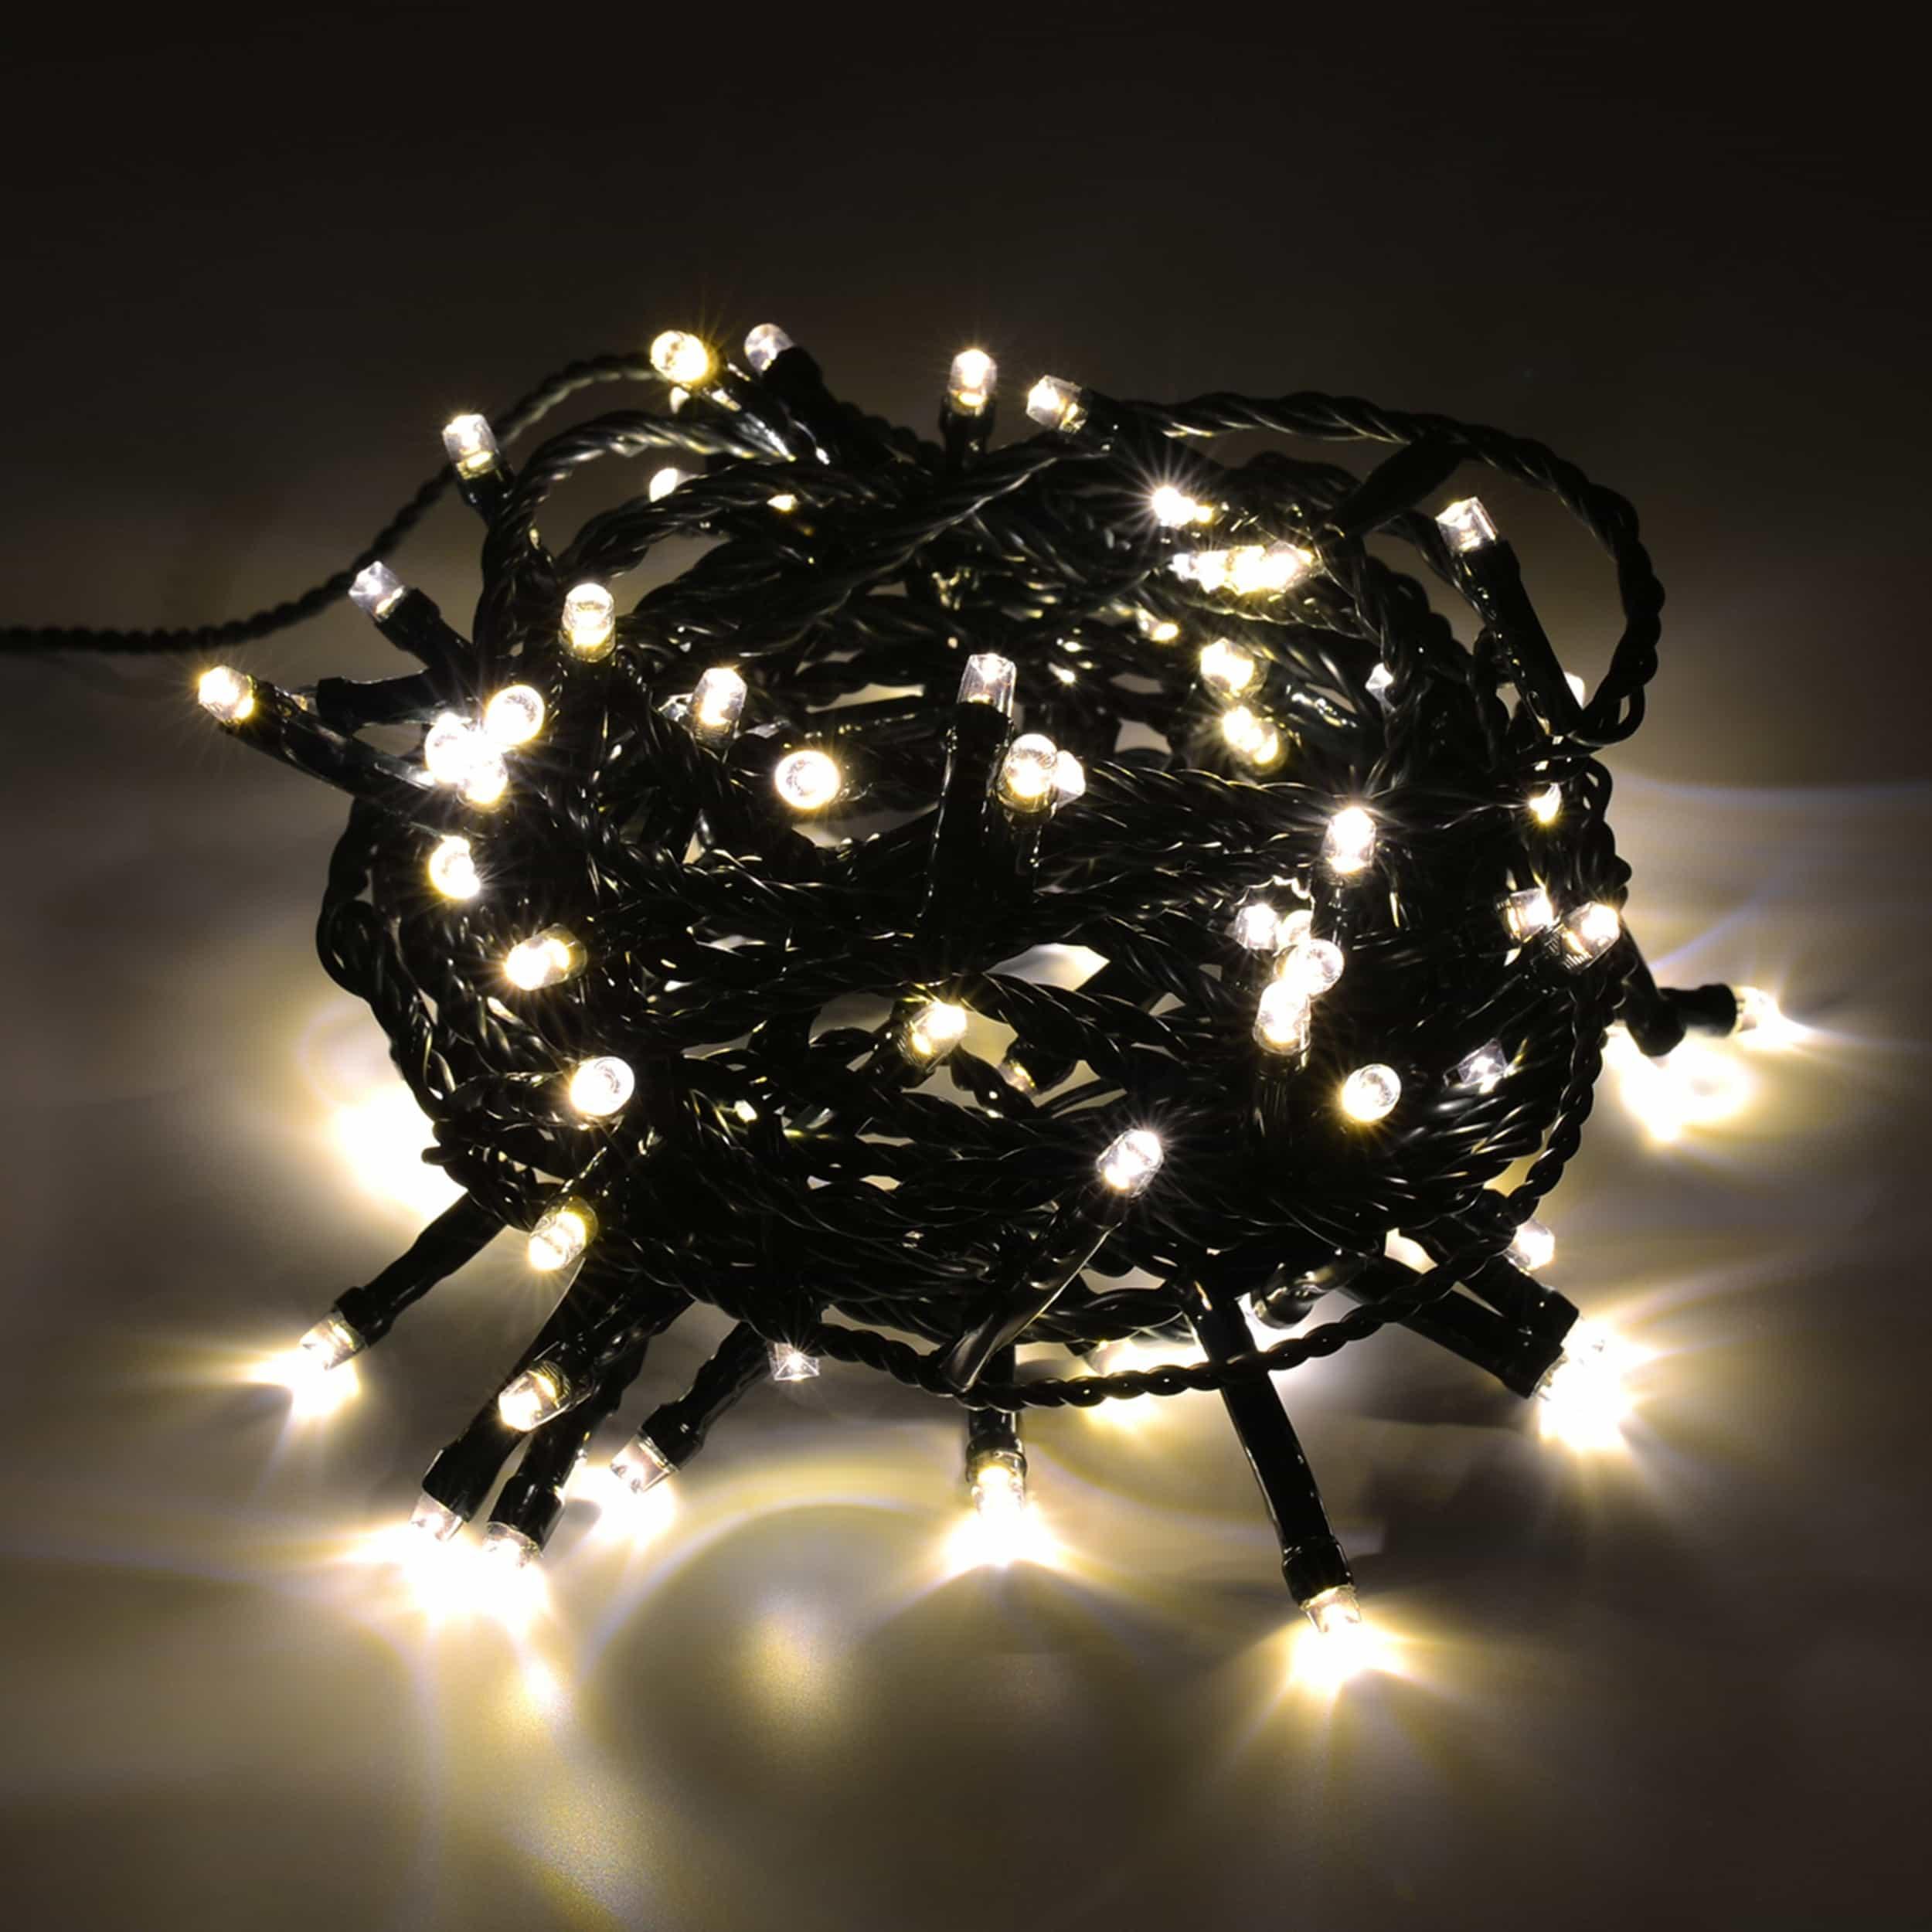 LED Lichterkette 200 LED energiesparend L10m warmweiß